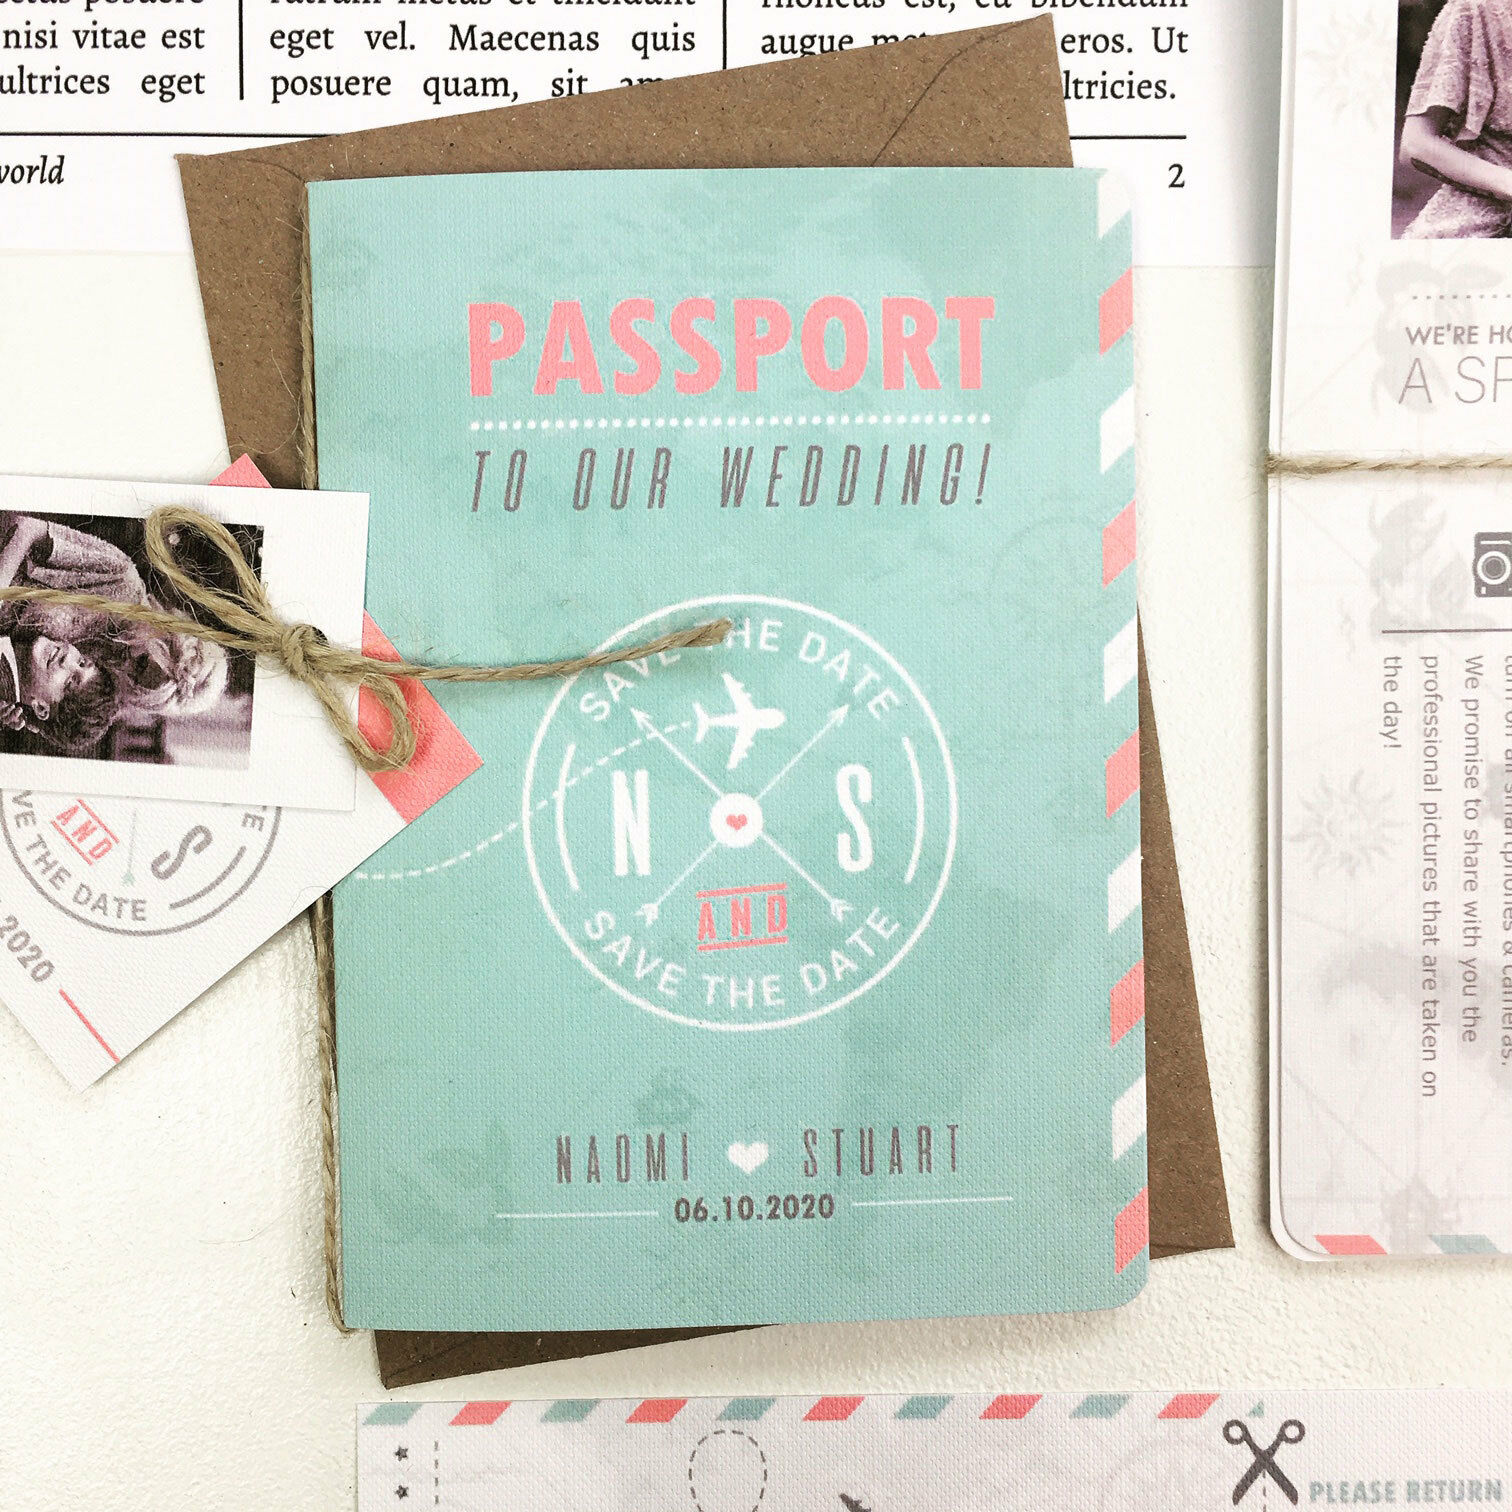 Passeport amour mariage invitation amour Passeport voyages outre-mer destination mariage inviter e60949